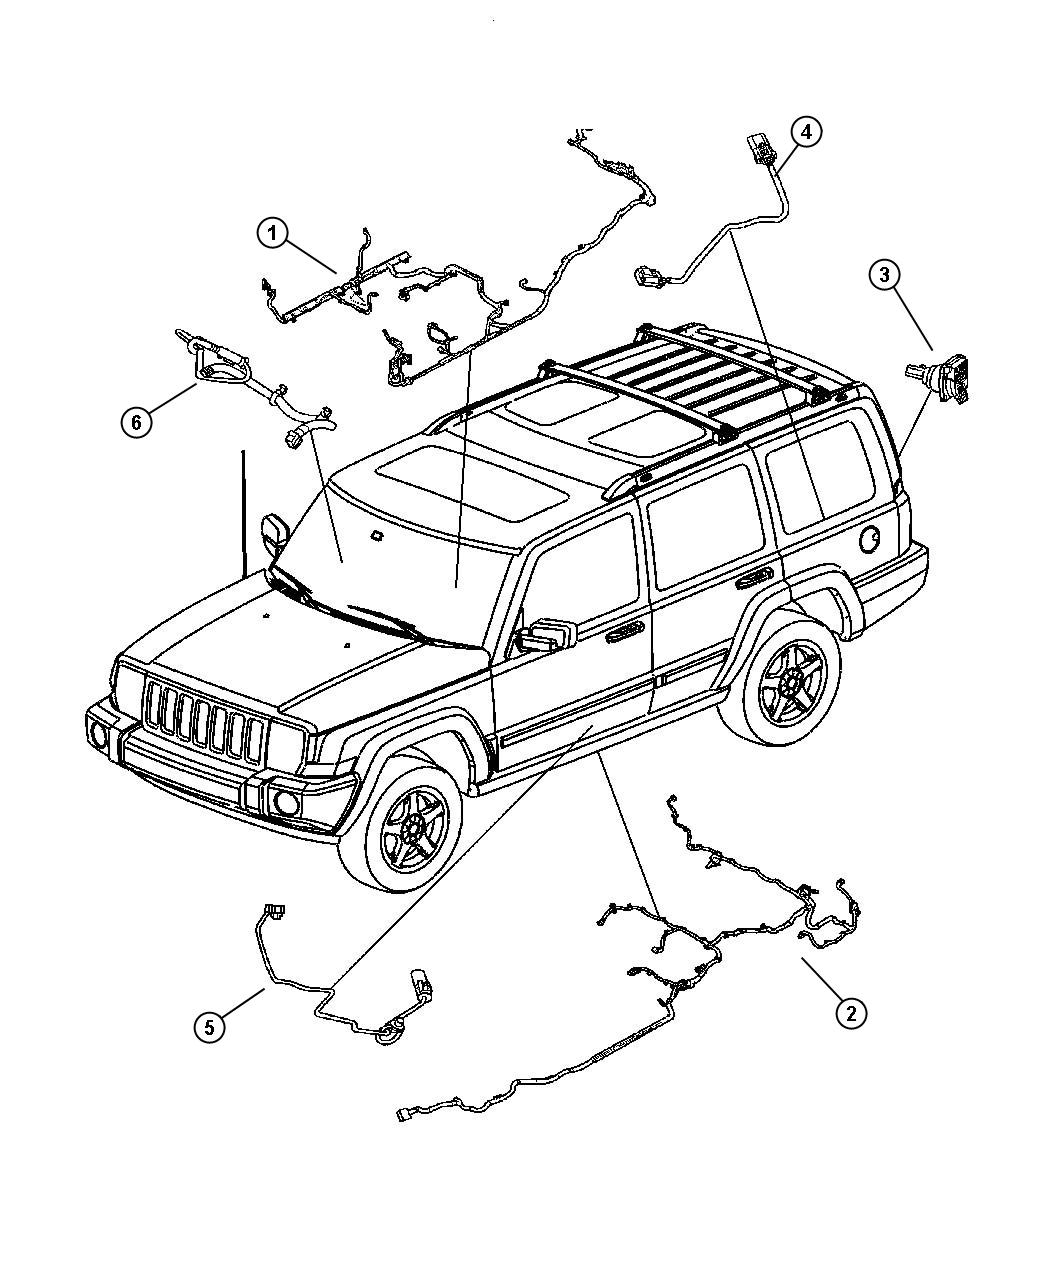 Jeep Commander Wiring Fuel Module Tank Skid